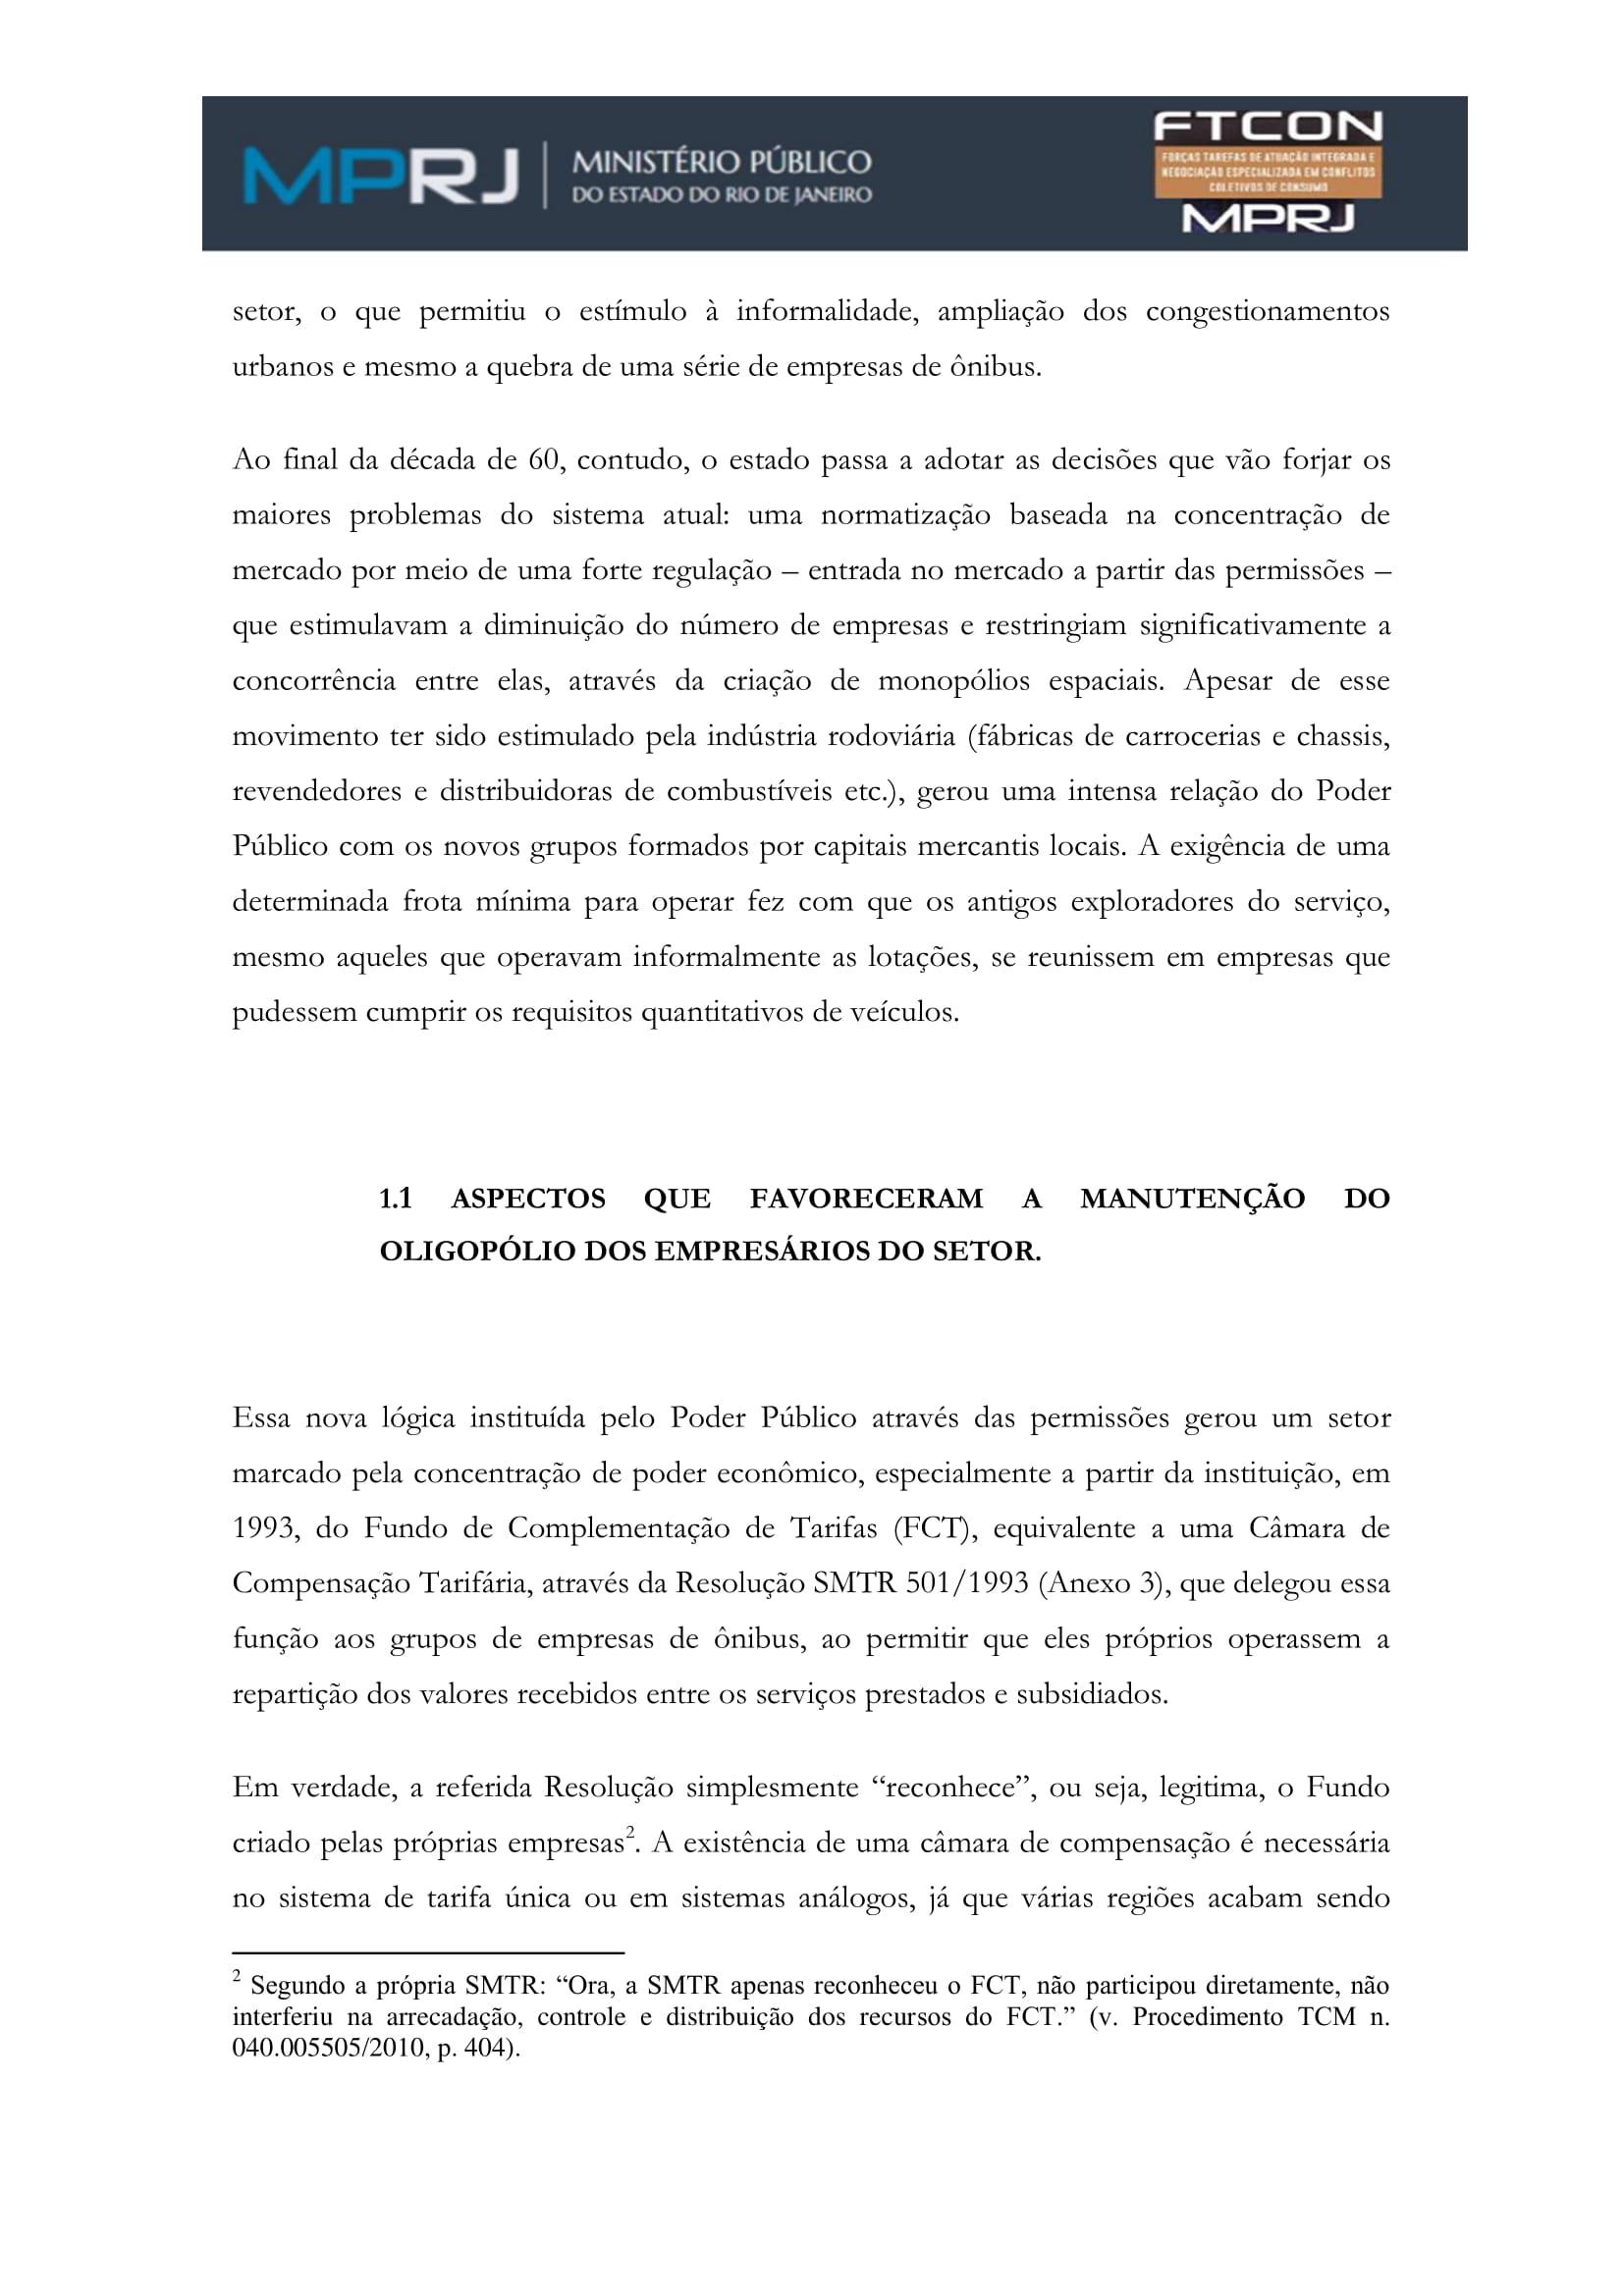 acp_caducidade_onibus_dr_rt-007